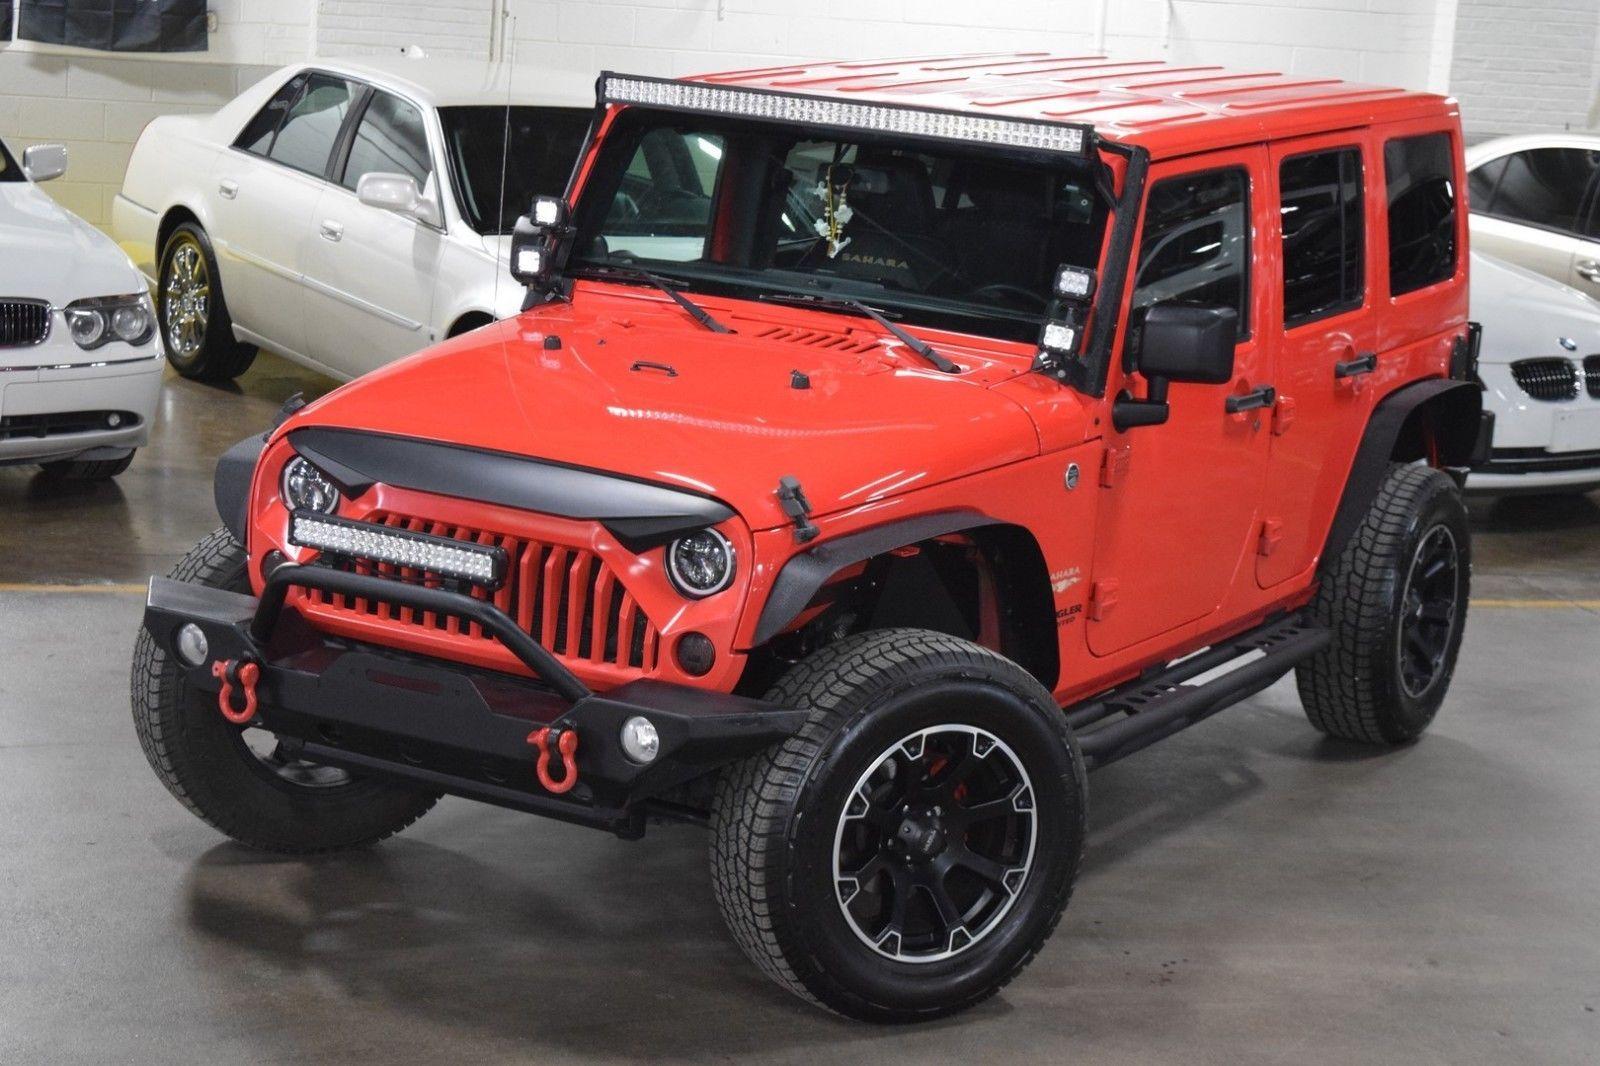 eBay 2013 Jeep Wrangler 4dr Sport Unlimited 2013 JEEP JK